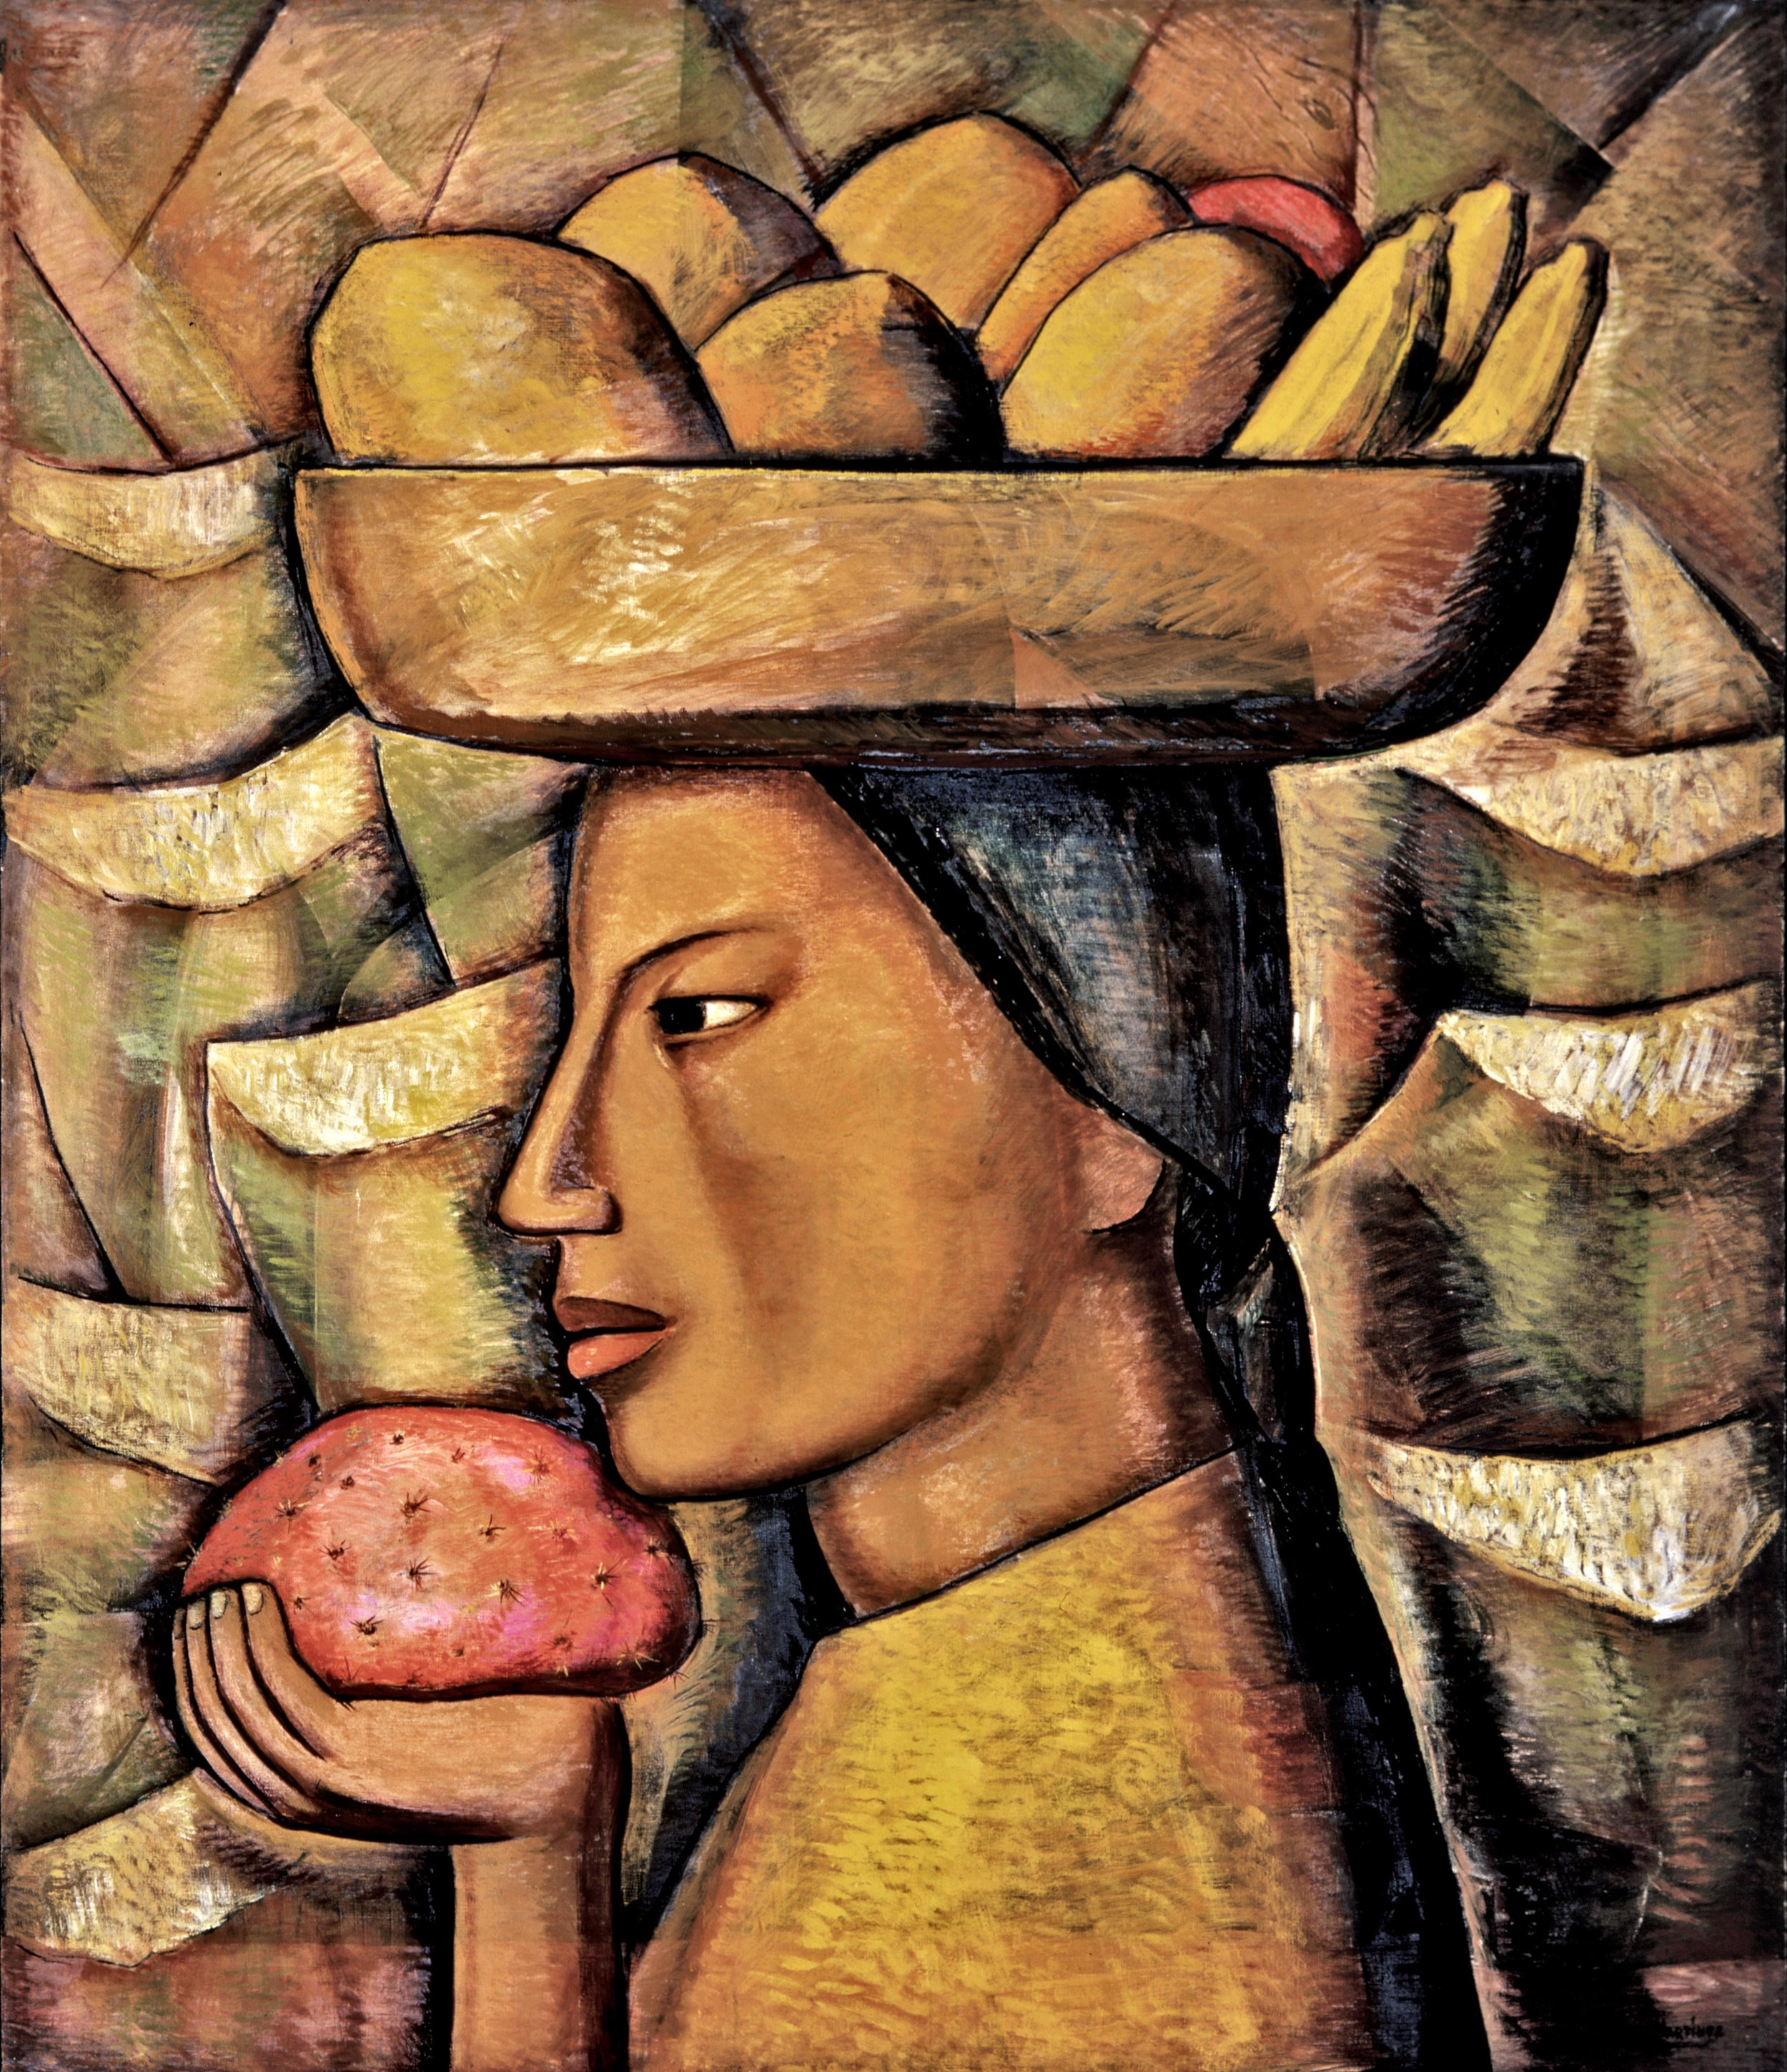 La India de las Tunas / Indian Woman with Prickly Pears  ca. 1932 oil on canvas / óleo sobre tela 50 x 42.3 inches; 127 x 107.3 centímetros Private collection